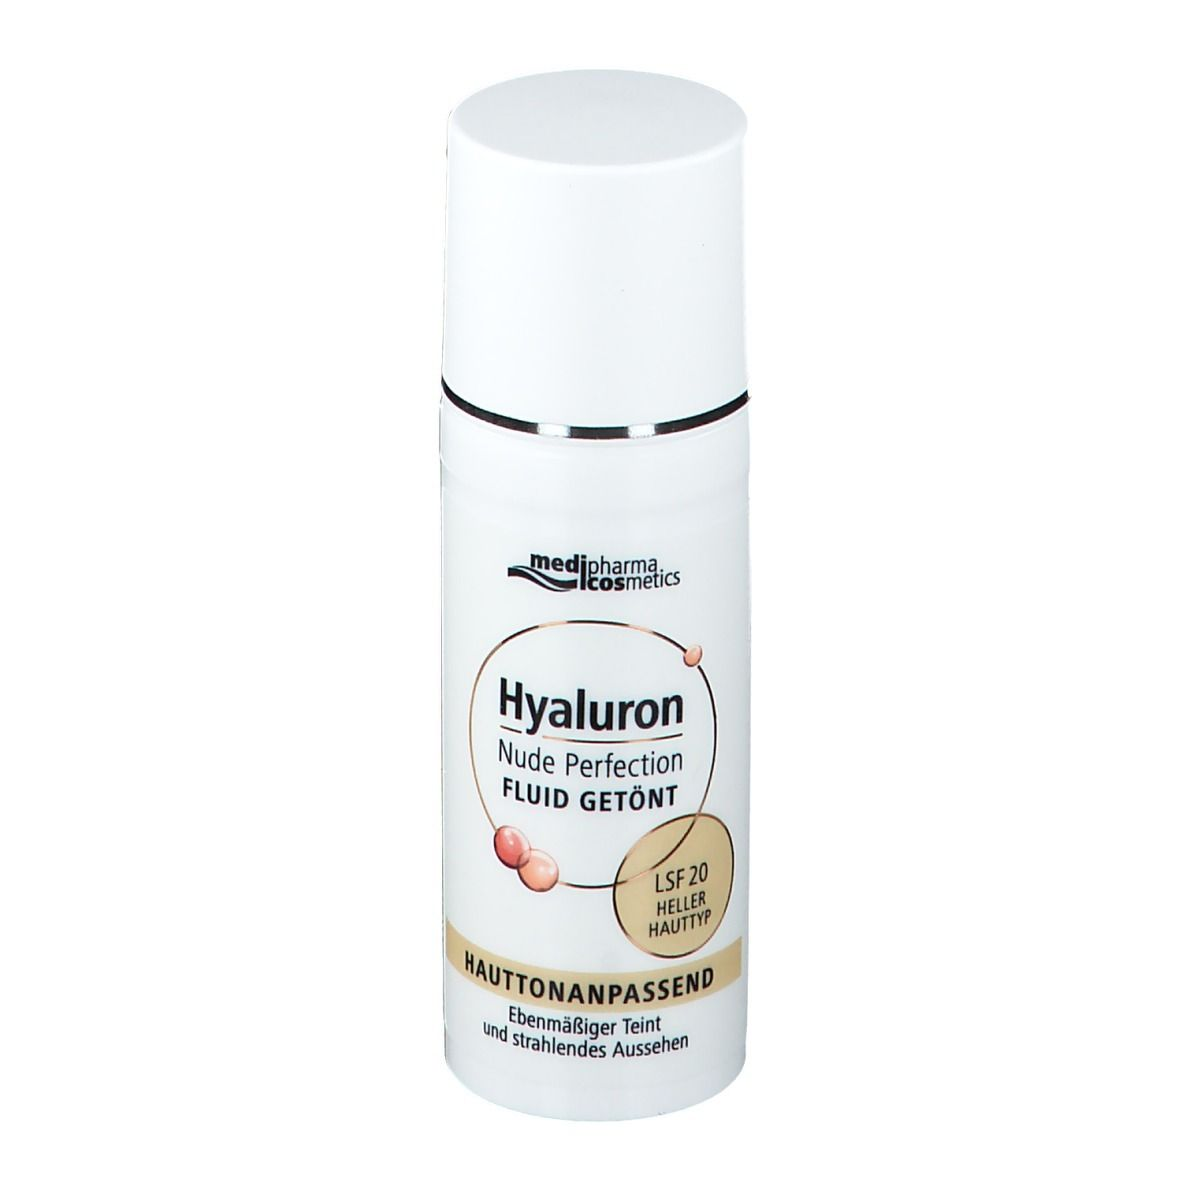 Medipharma Cosmetics HYALURON Nude Perfection getönt.Fluid